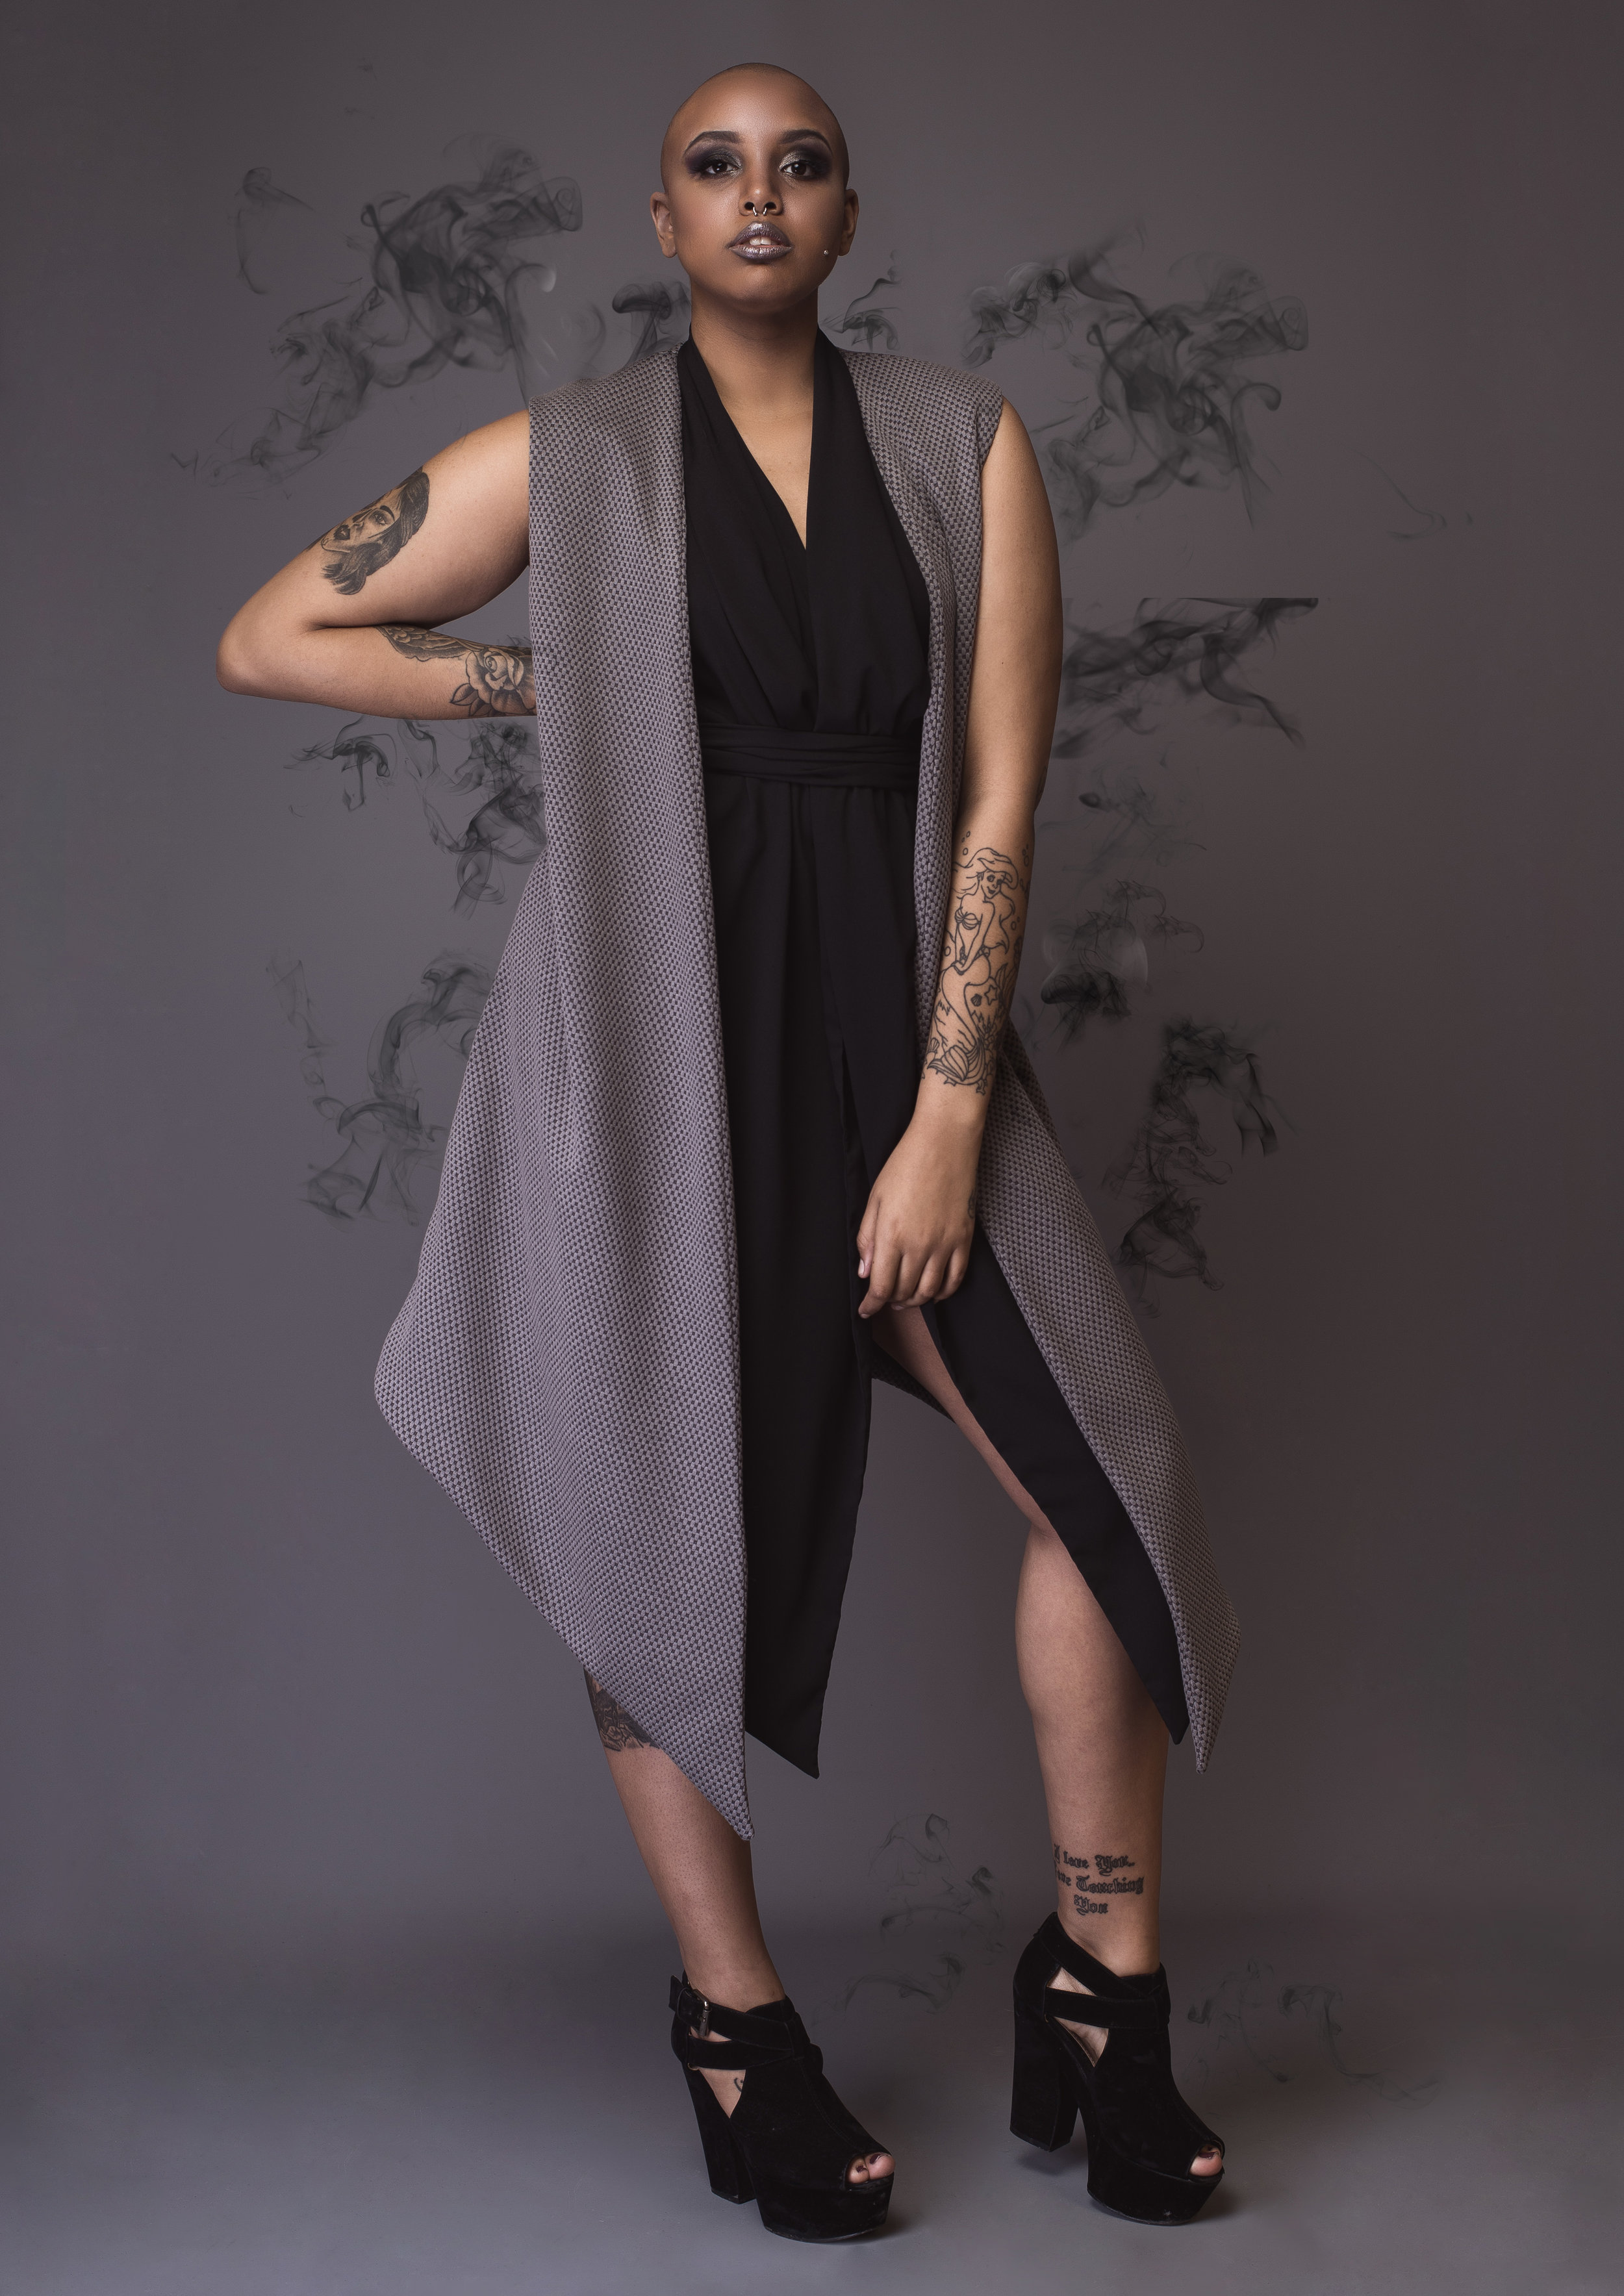 zaramia-ava-zaramiaava-leeds-fashion-designer-leedsfashiondesigner-stylist-leeds-stylist-leedsstylist-ethical-sustainable-minimalist-versatile-drape-wrap-grey-cowl-emi-noa--2